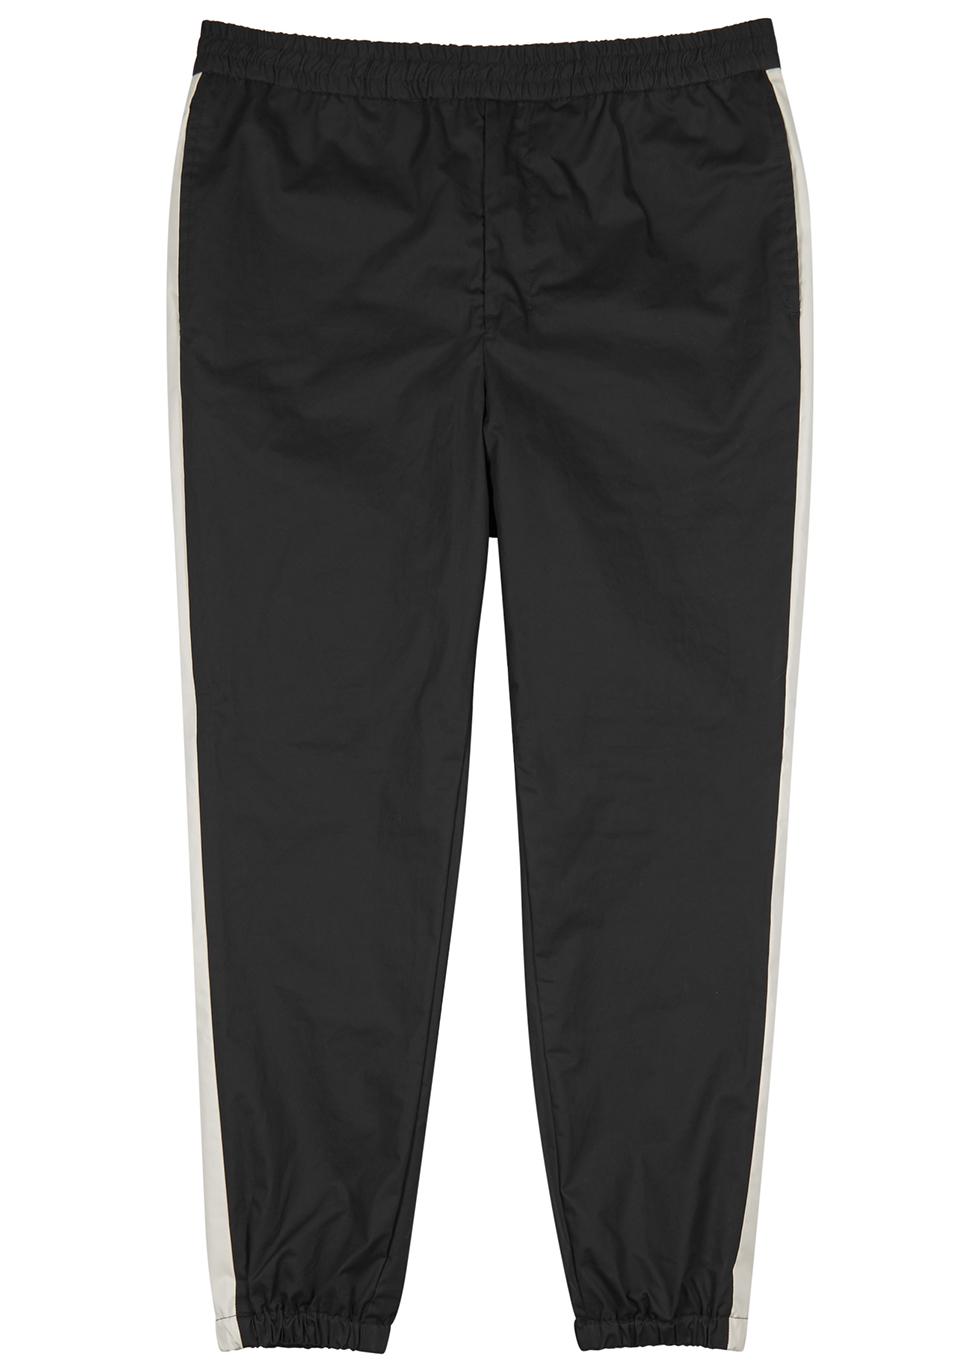 Black cotton sweatpants - AMI